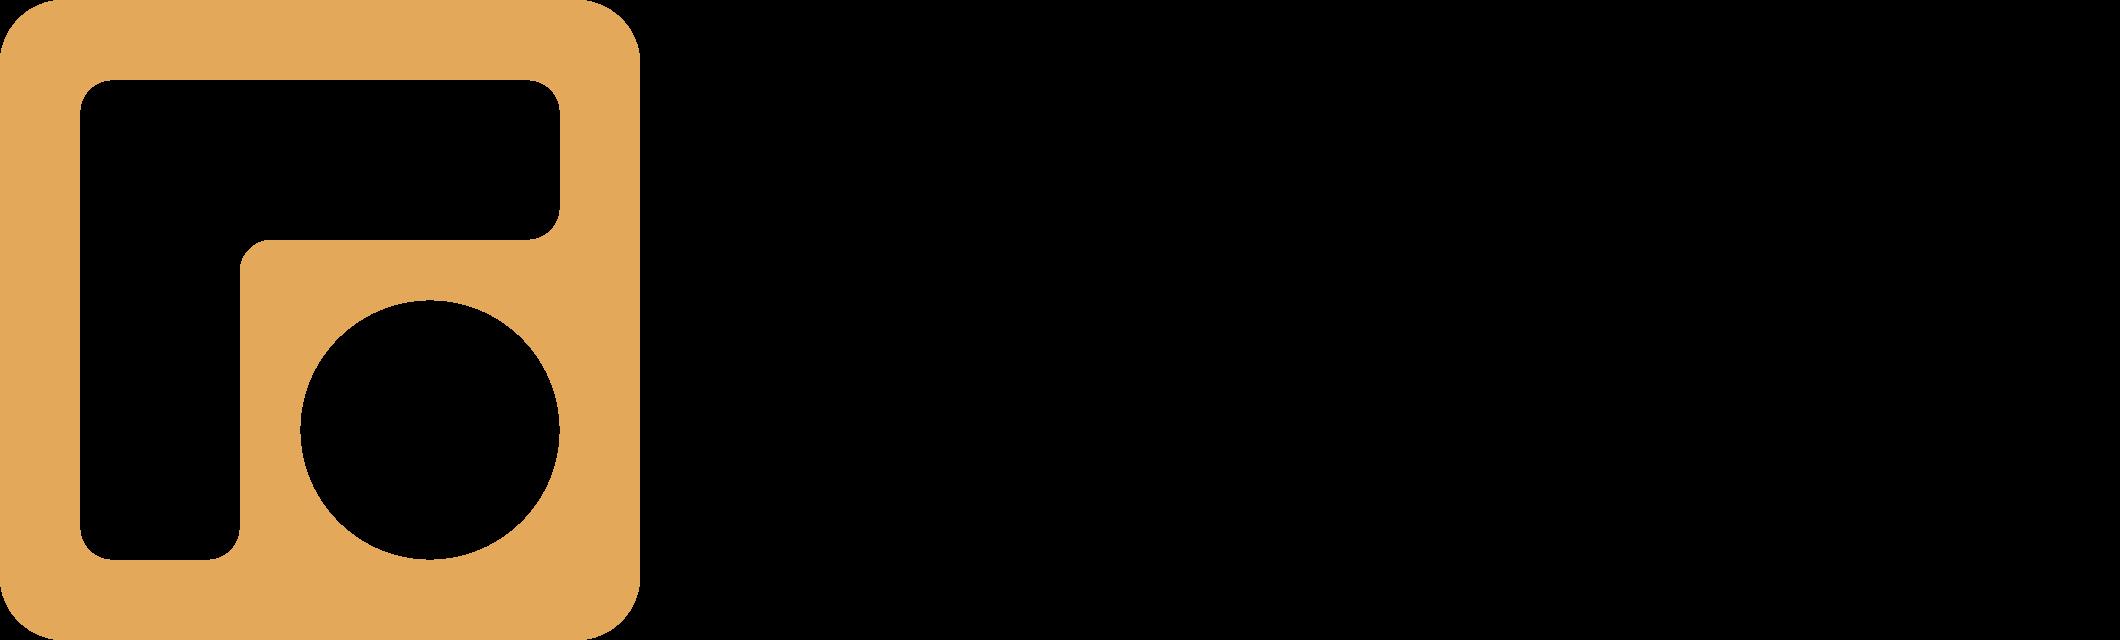 Fleex logo